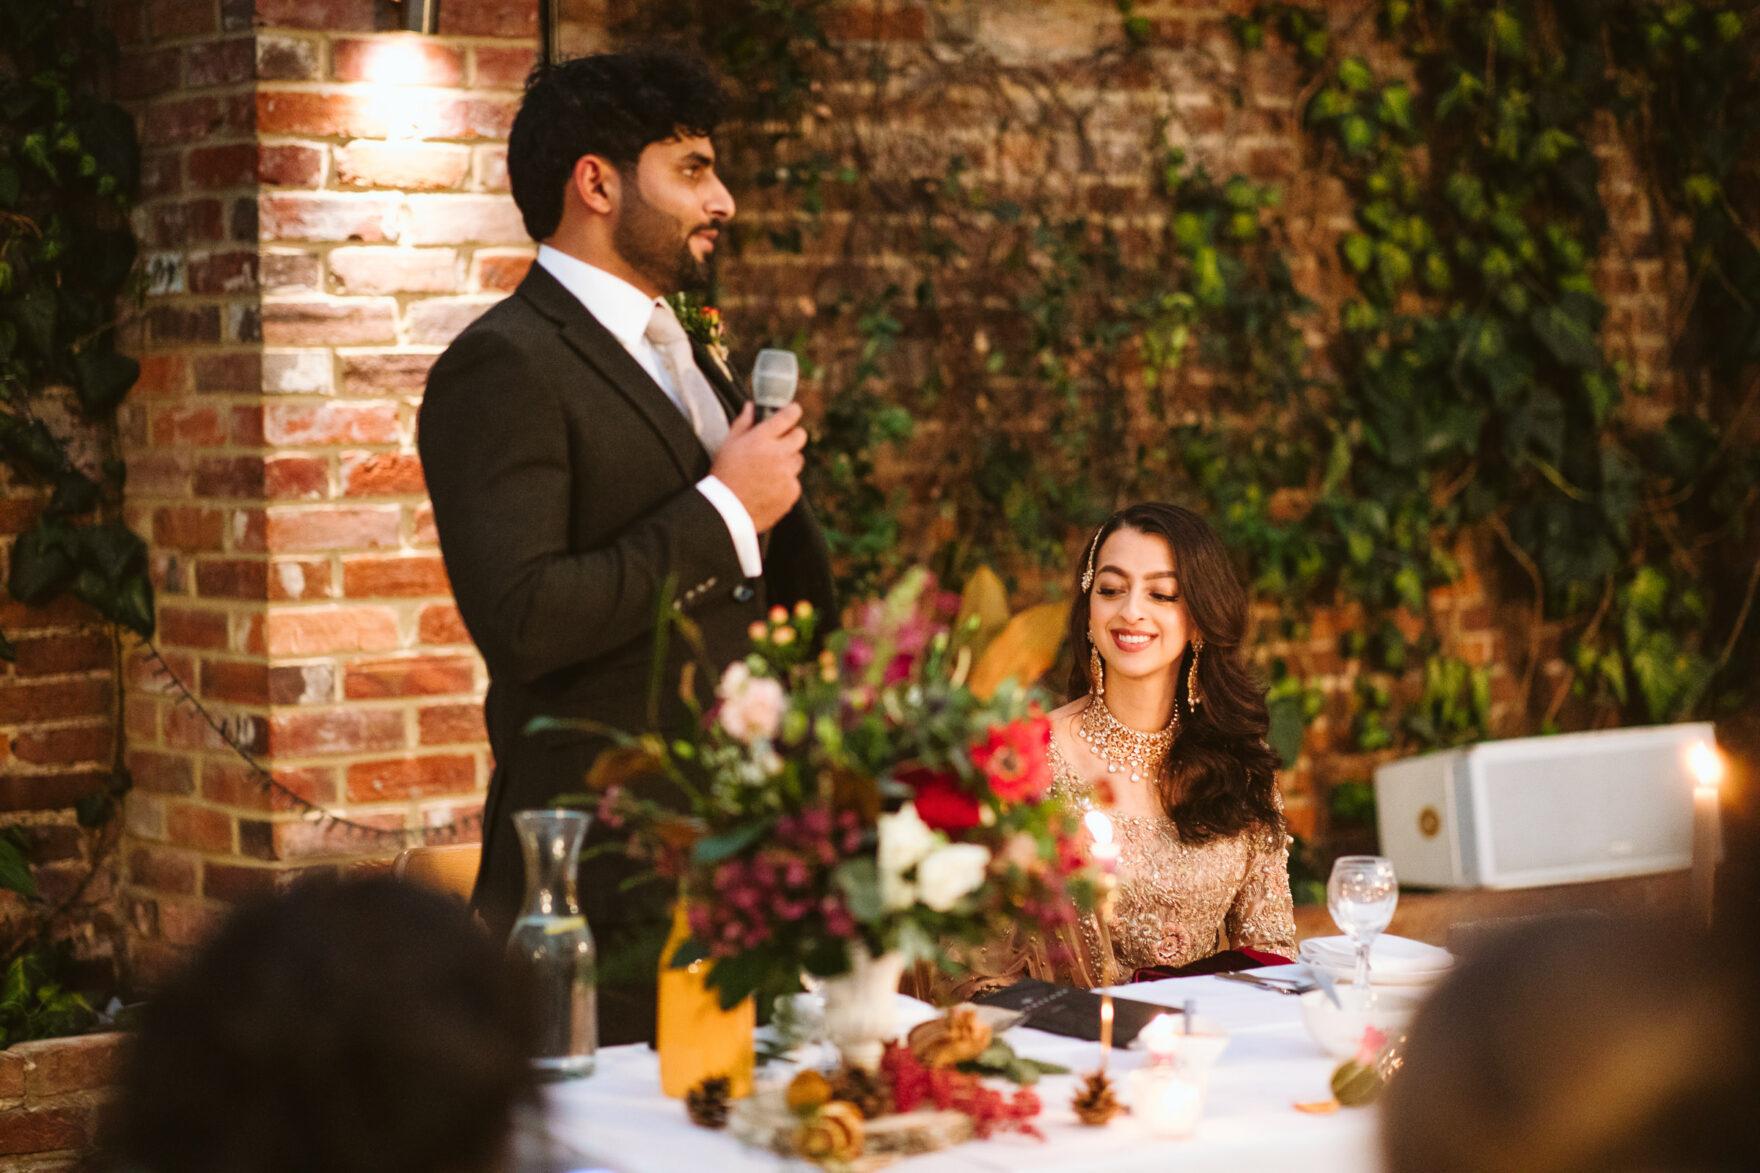 Muslim Groom speeches at his Islamic Wedding